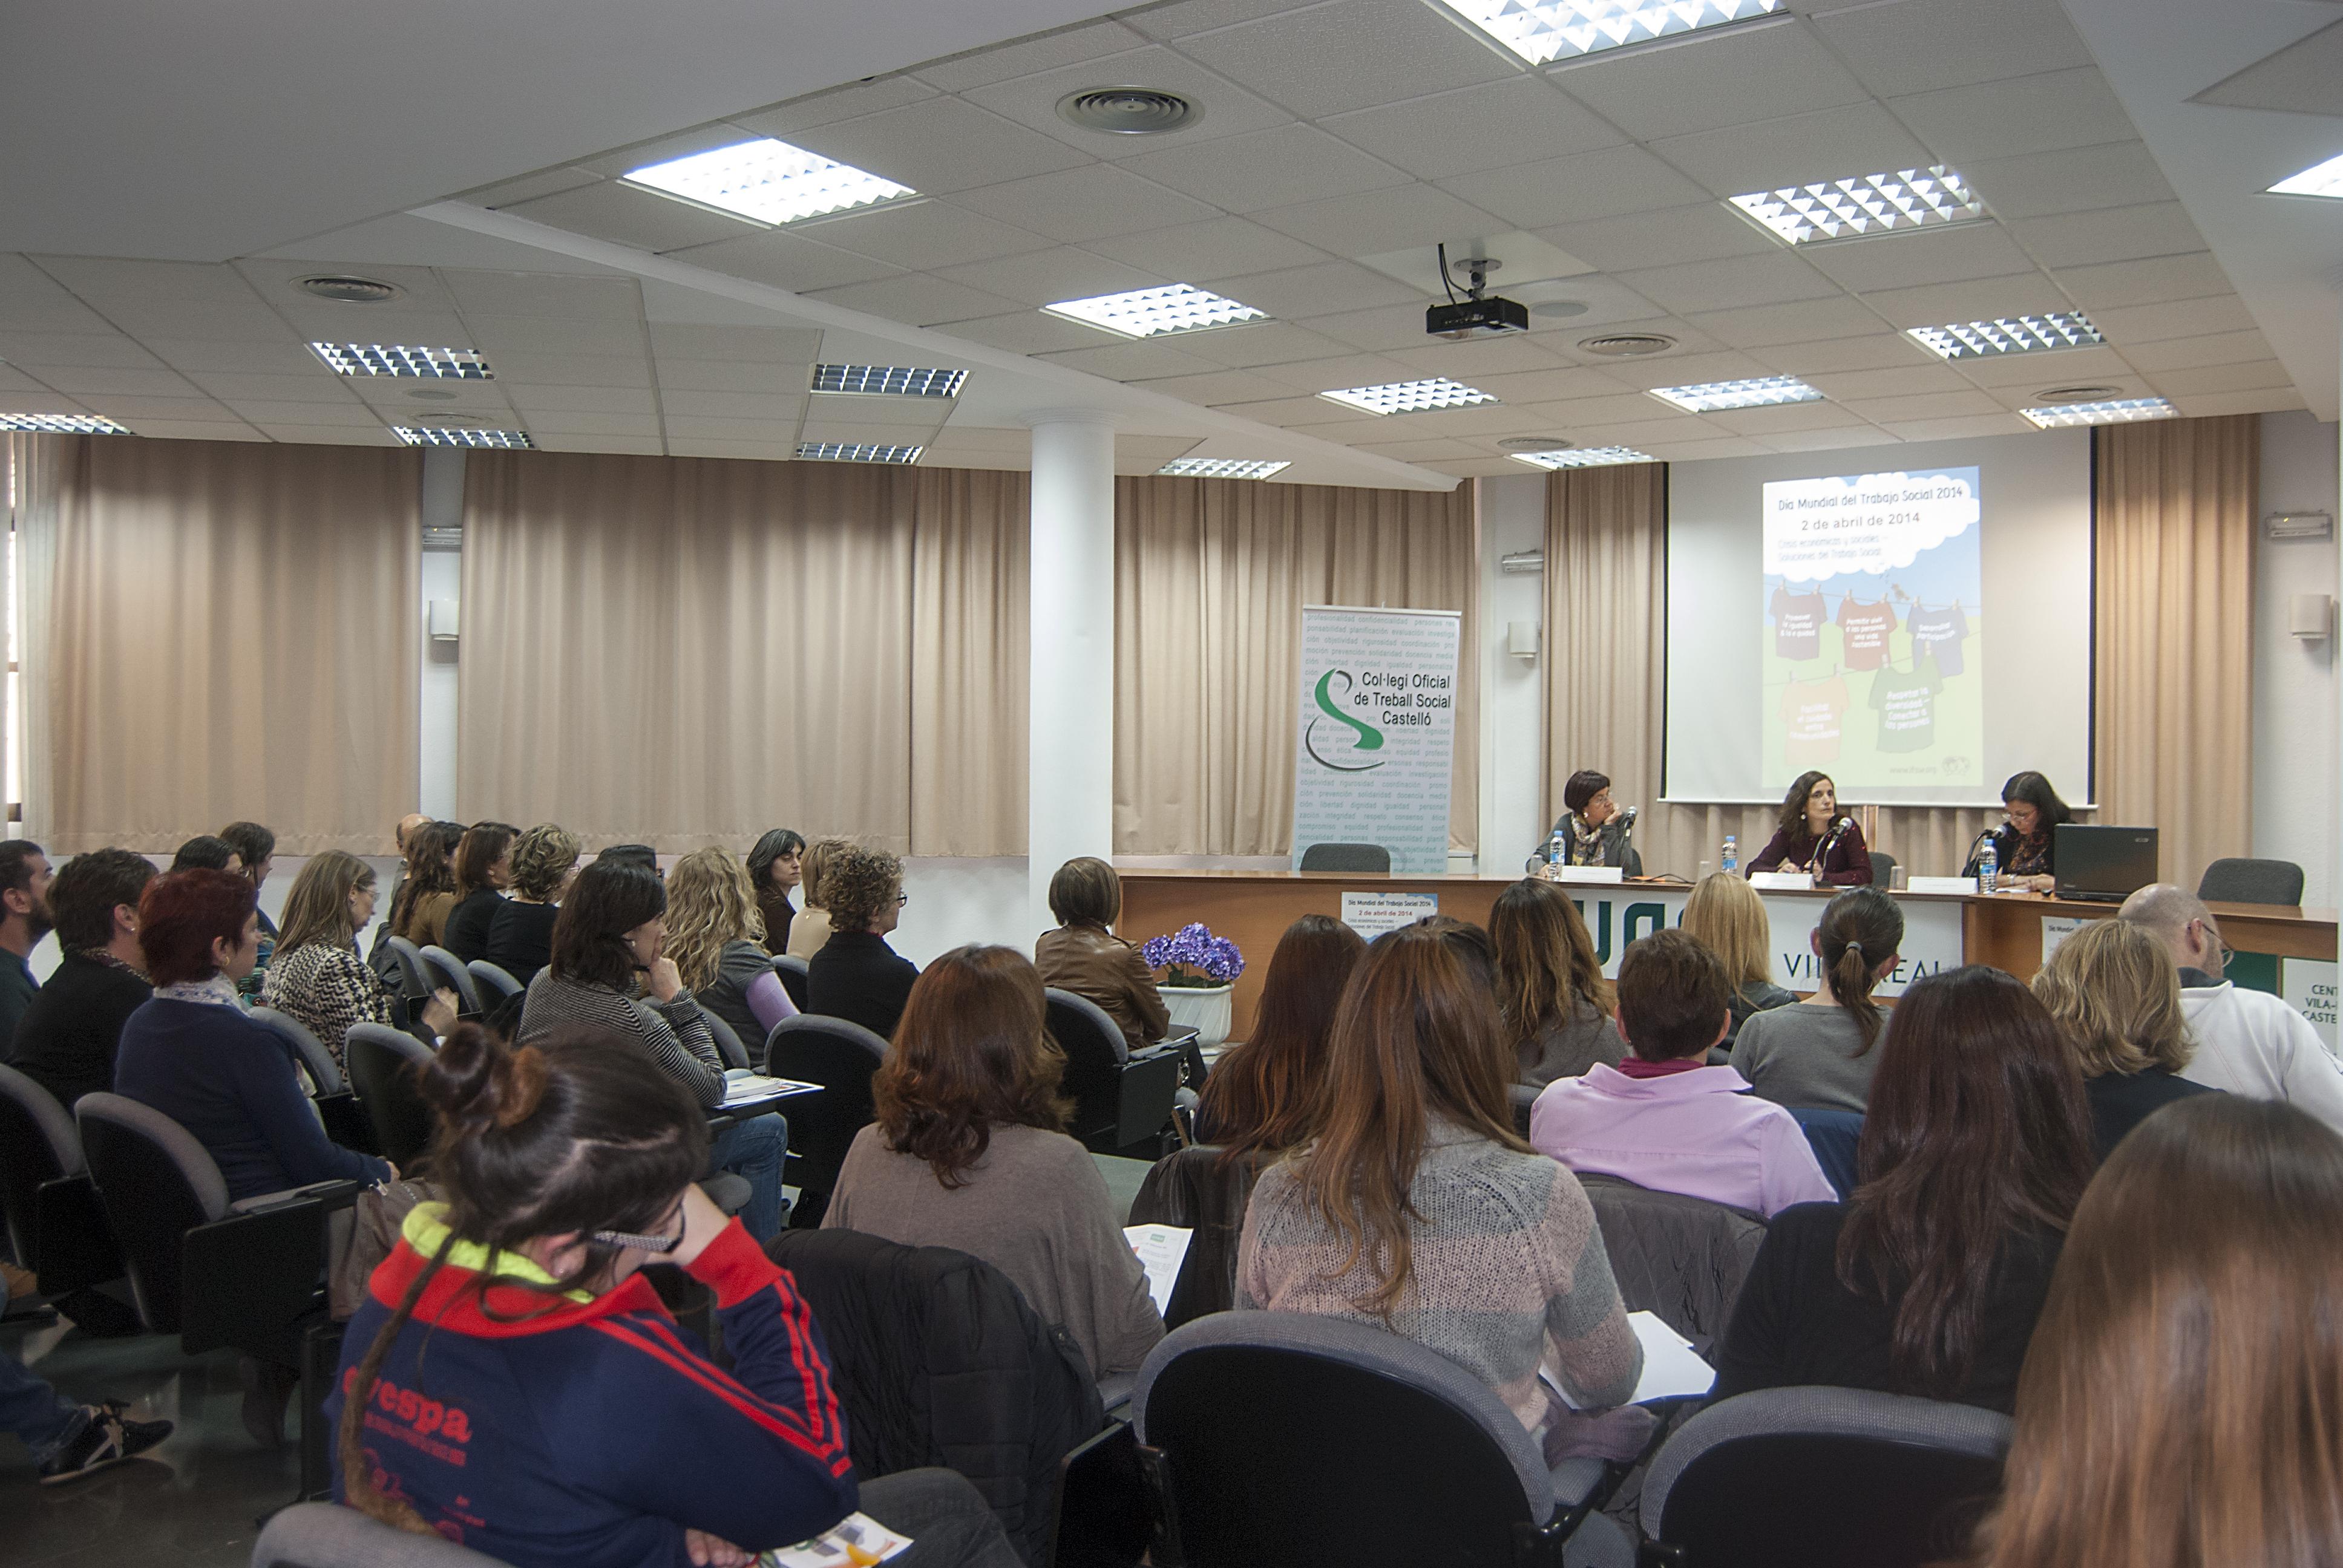 http://www.cgtrabajosocial.es/files/533ec60d096d4/DiaInternacionalTrabajoSocial03.jpg